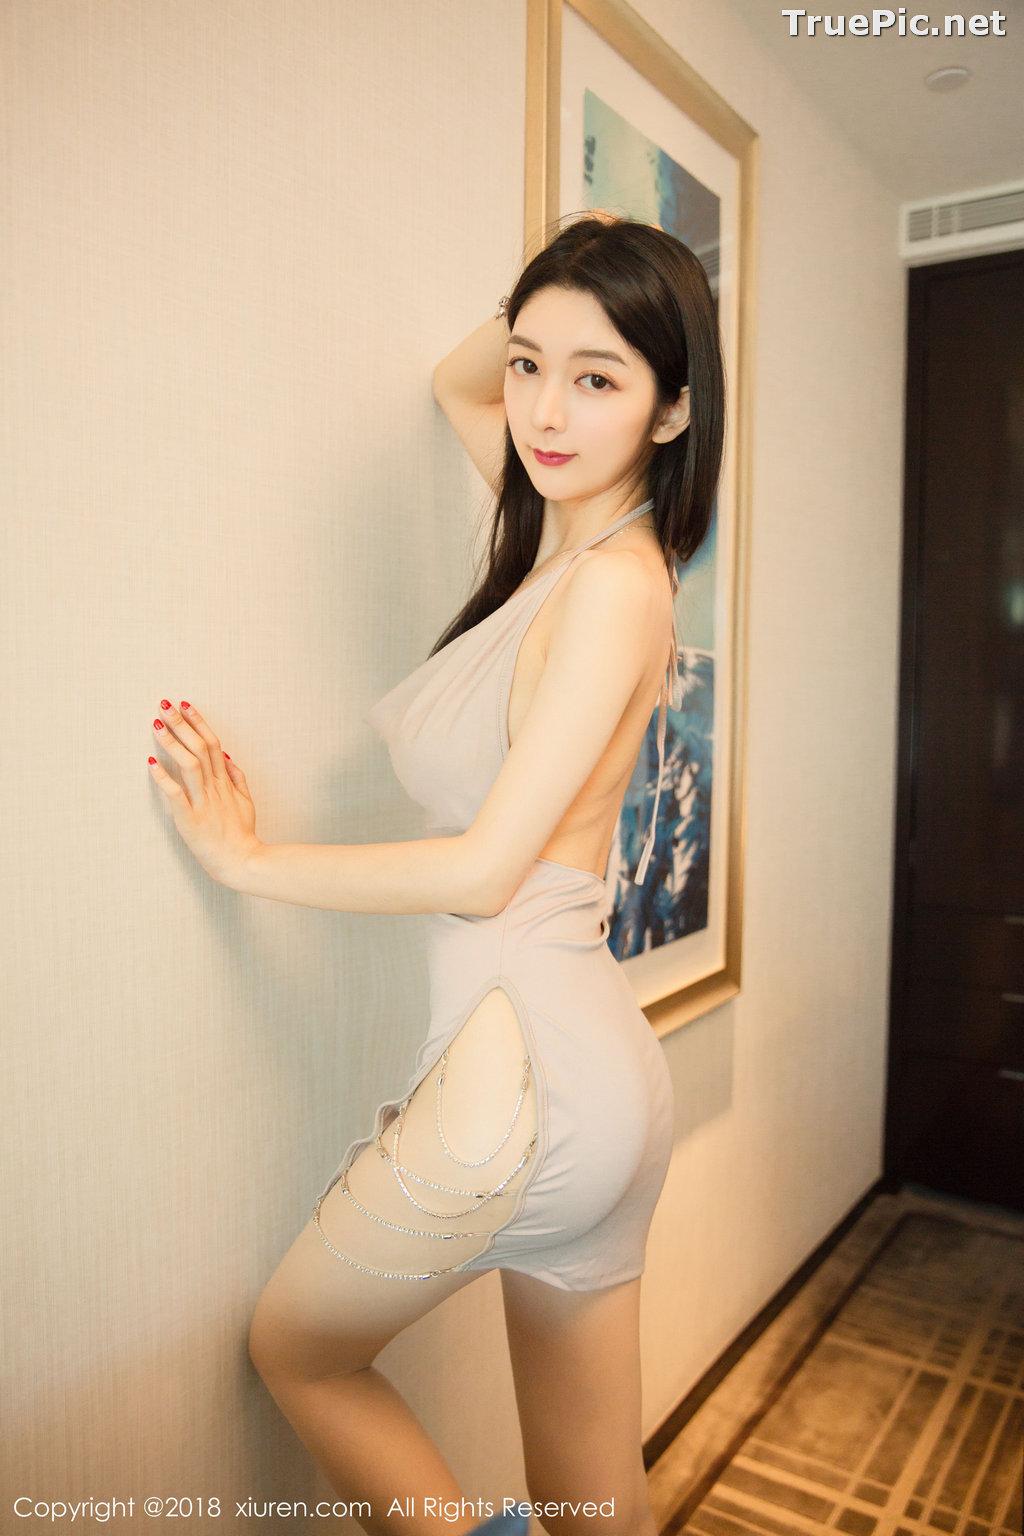 Image XIUREN No.1141 - Chinese Model - Xiao Reba (Angela小热巴) - Sexy Dress Tonight - TruePic.net - Picture-14